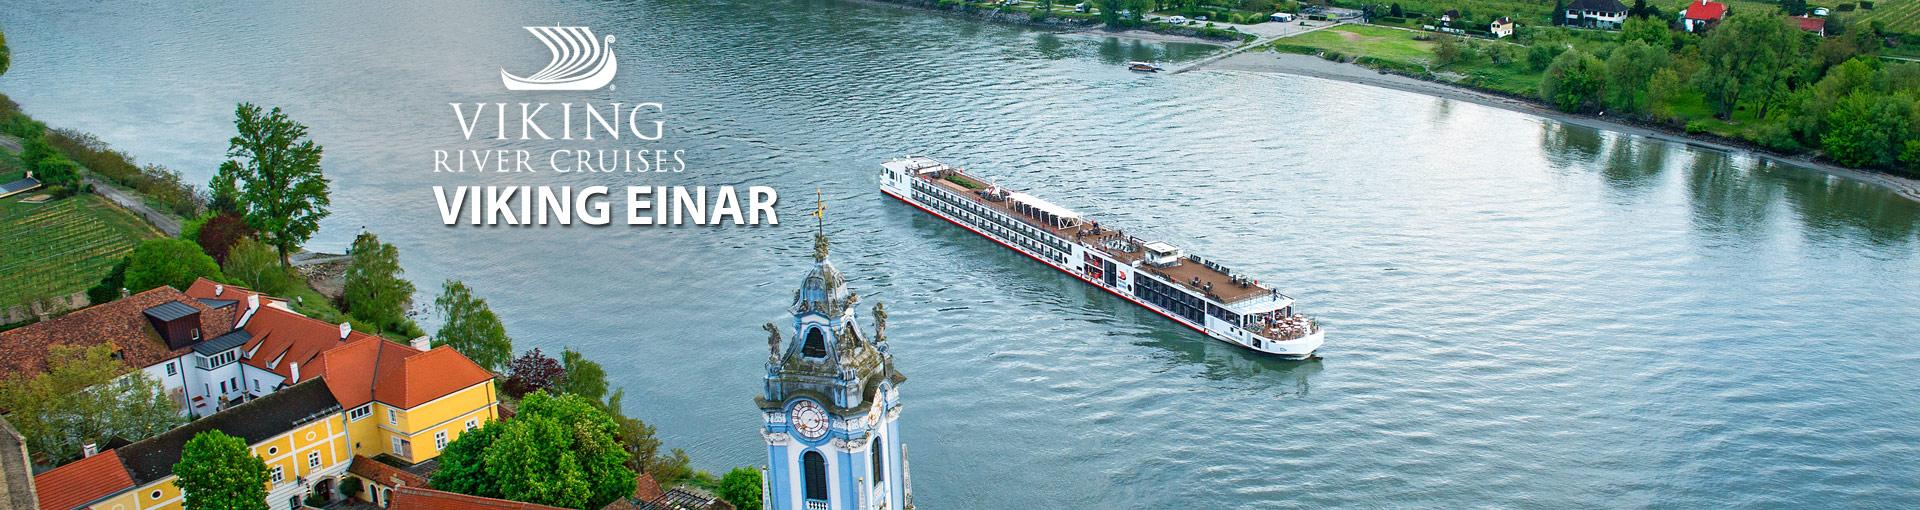 Viking River Cruises Viking Einar river ship